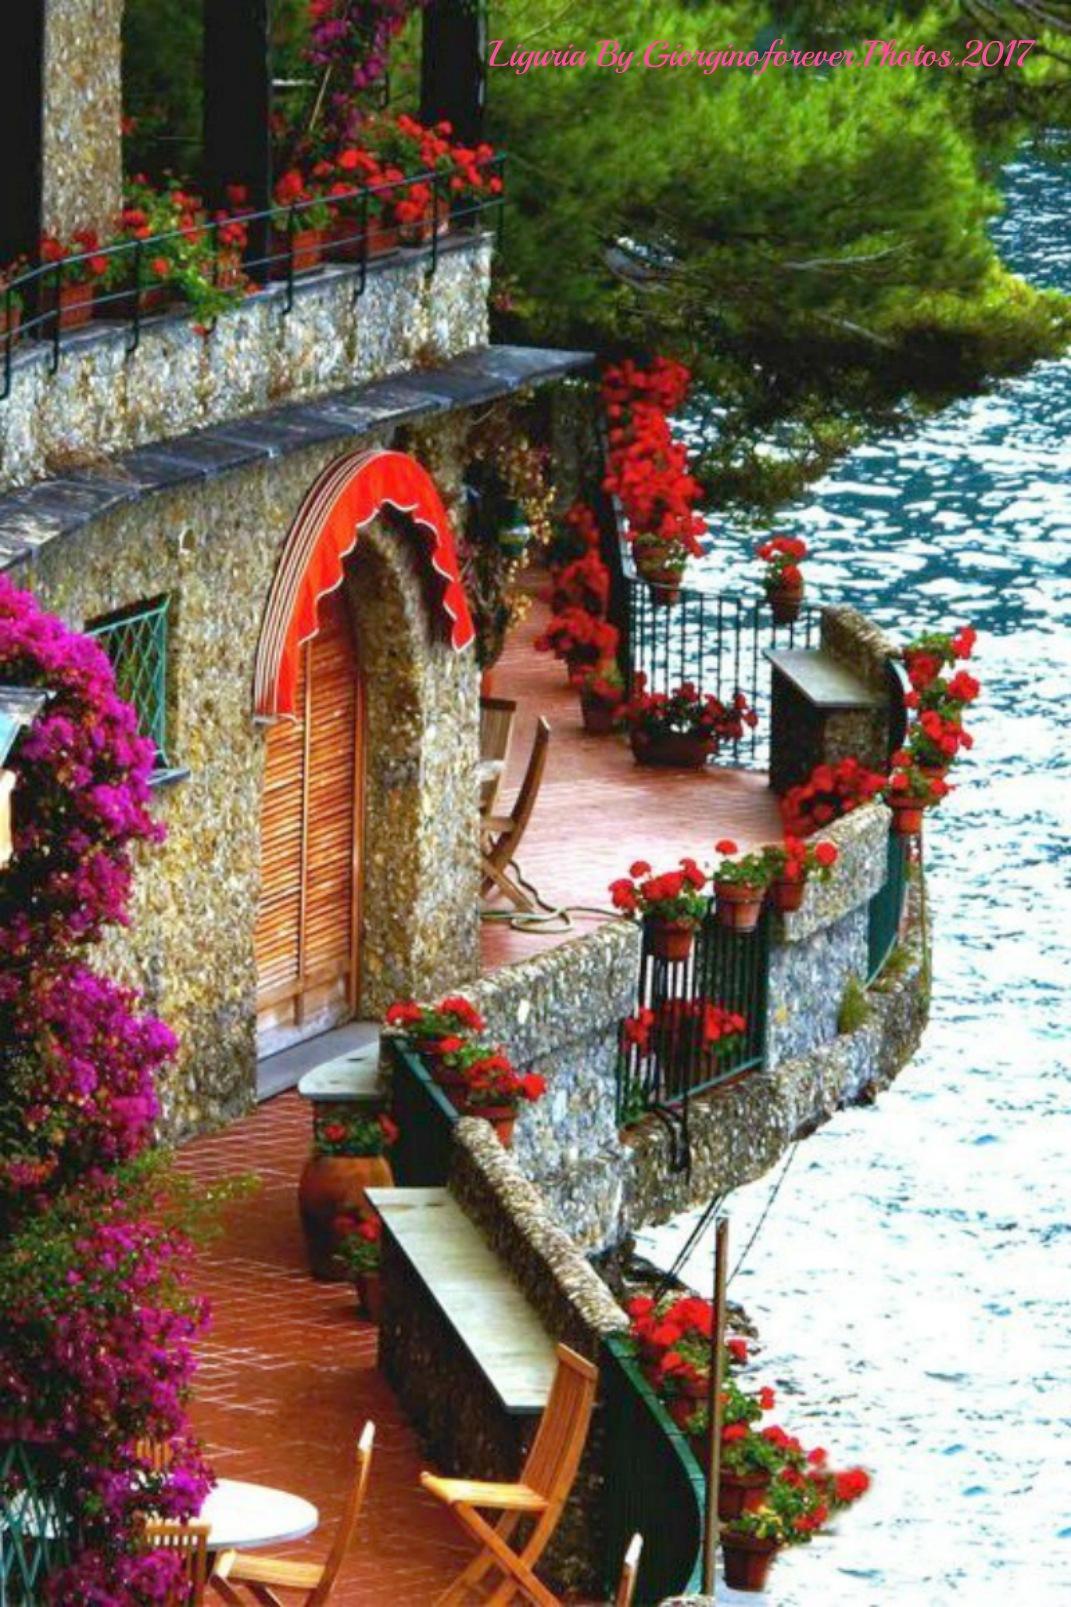 Liguria Italia Bella xxx by karenanne.borsani